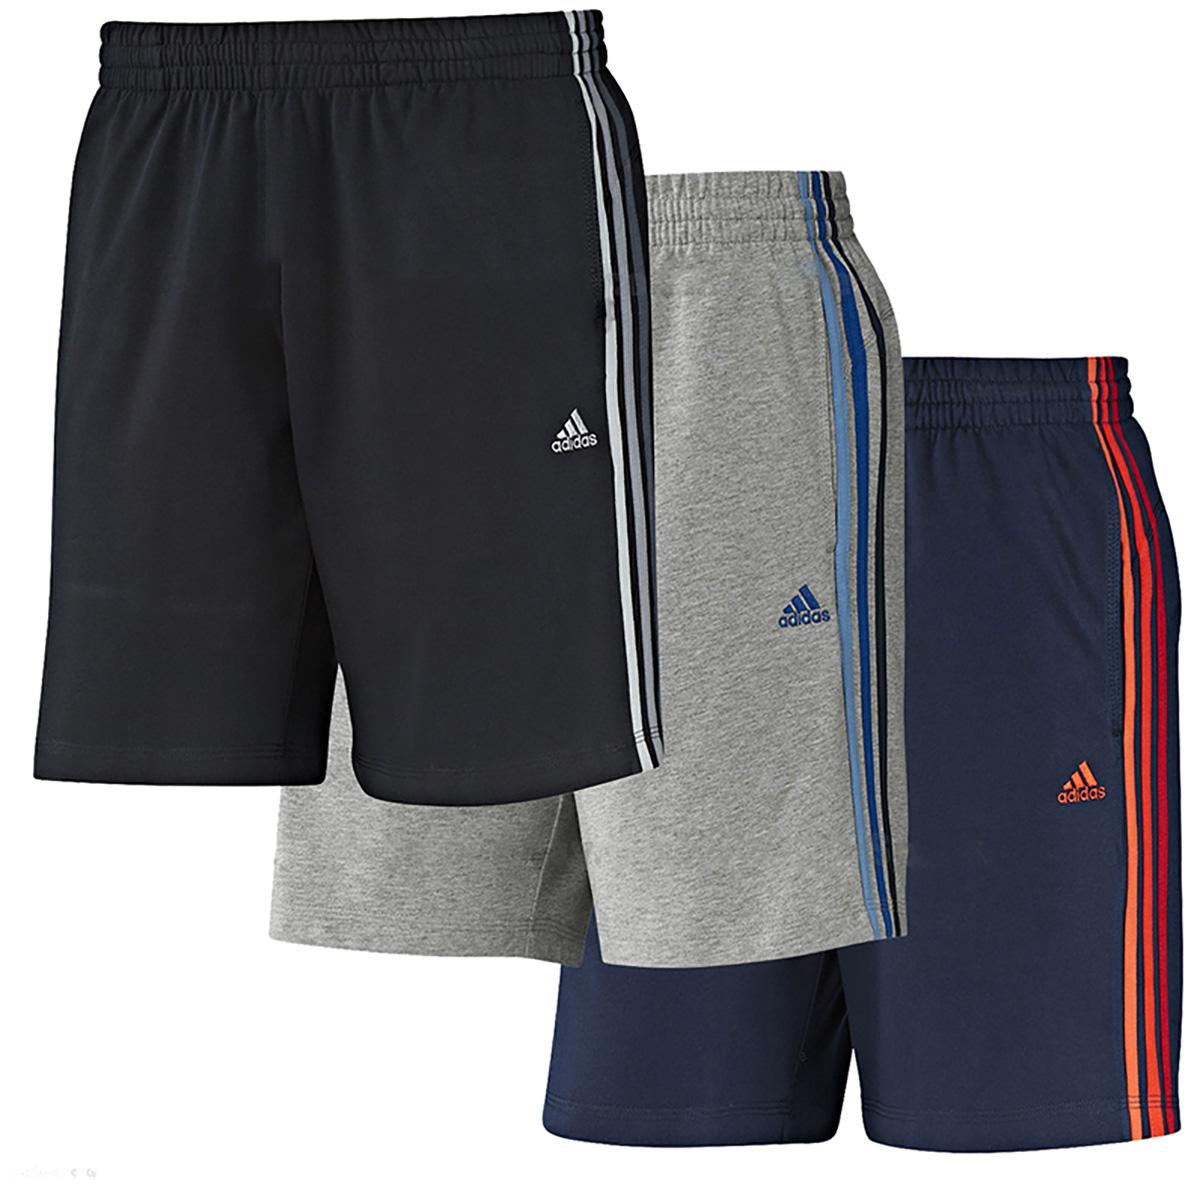 Mens Adidas Clima 365 Performance Ess Cotton Jersey Shorts ...